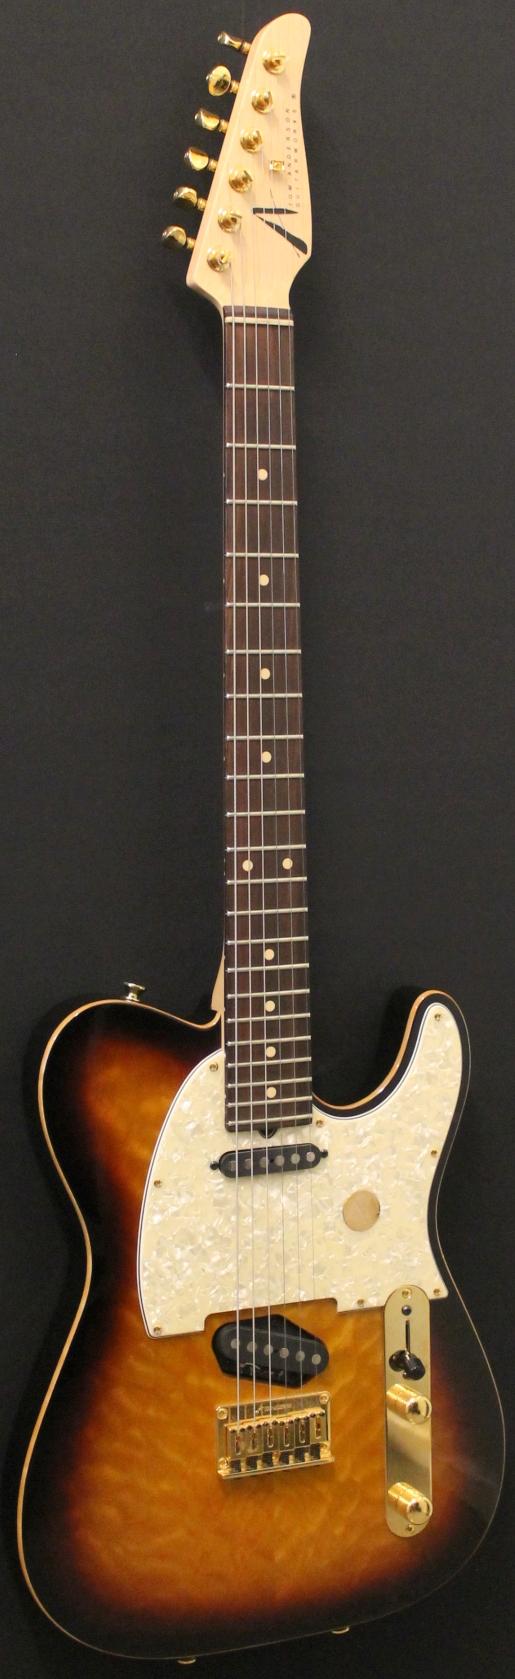 Tom Anderson Hollow T 1994 Guitar For Sale Kitarakuu Oy